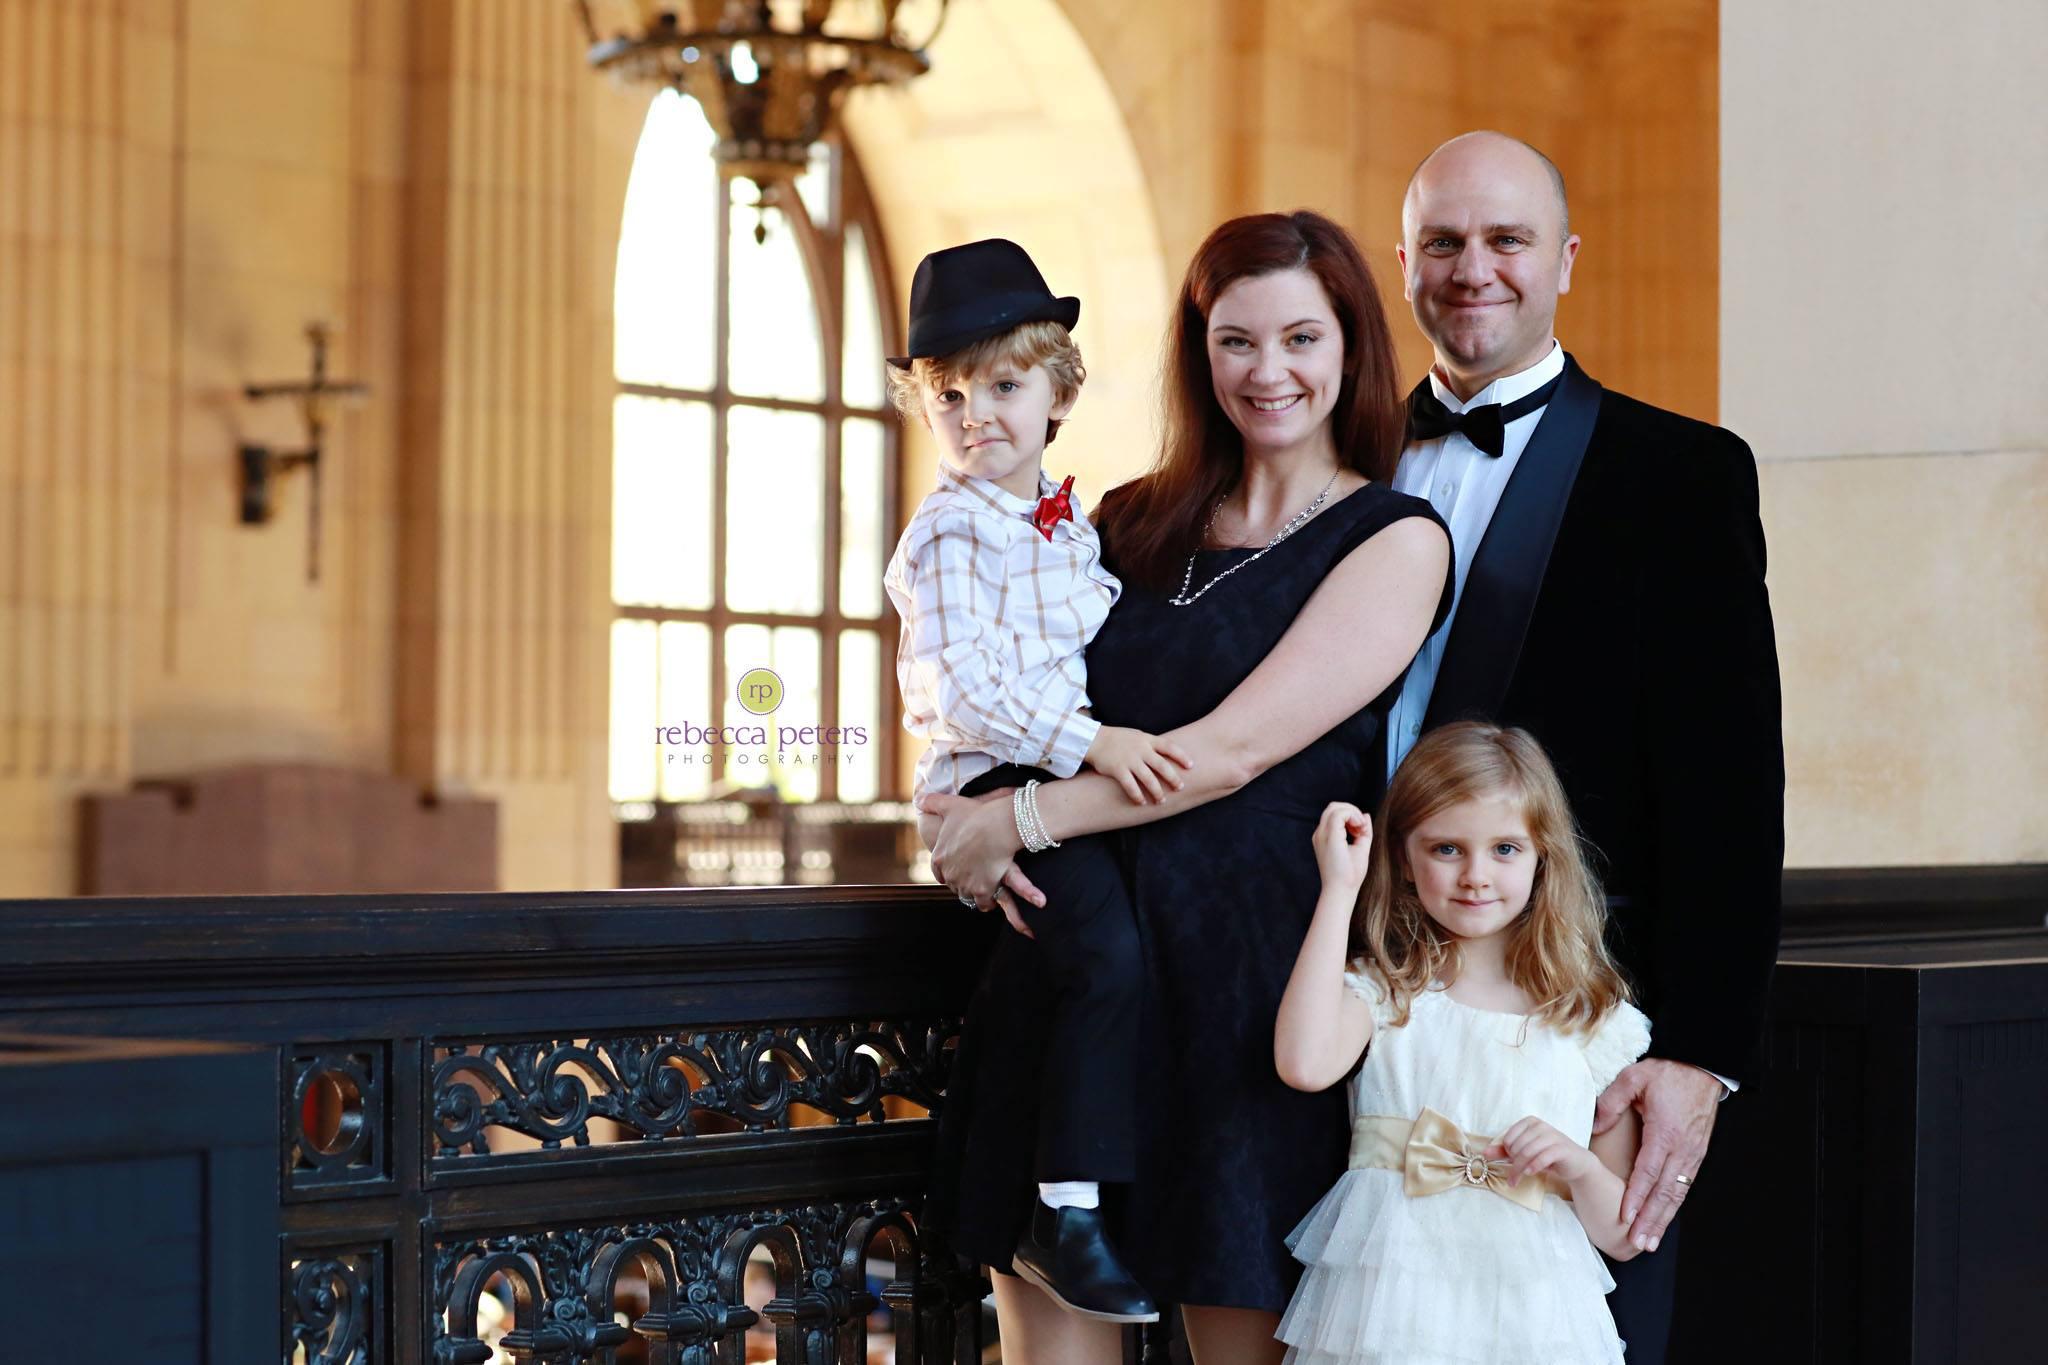 Dr. Mateo & Family